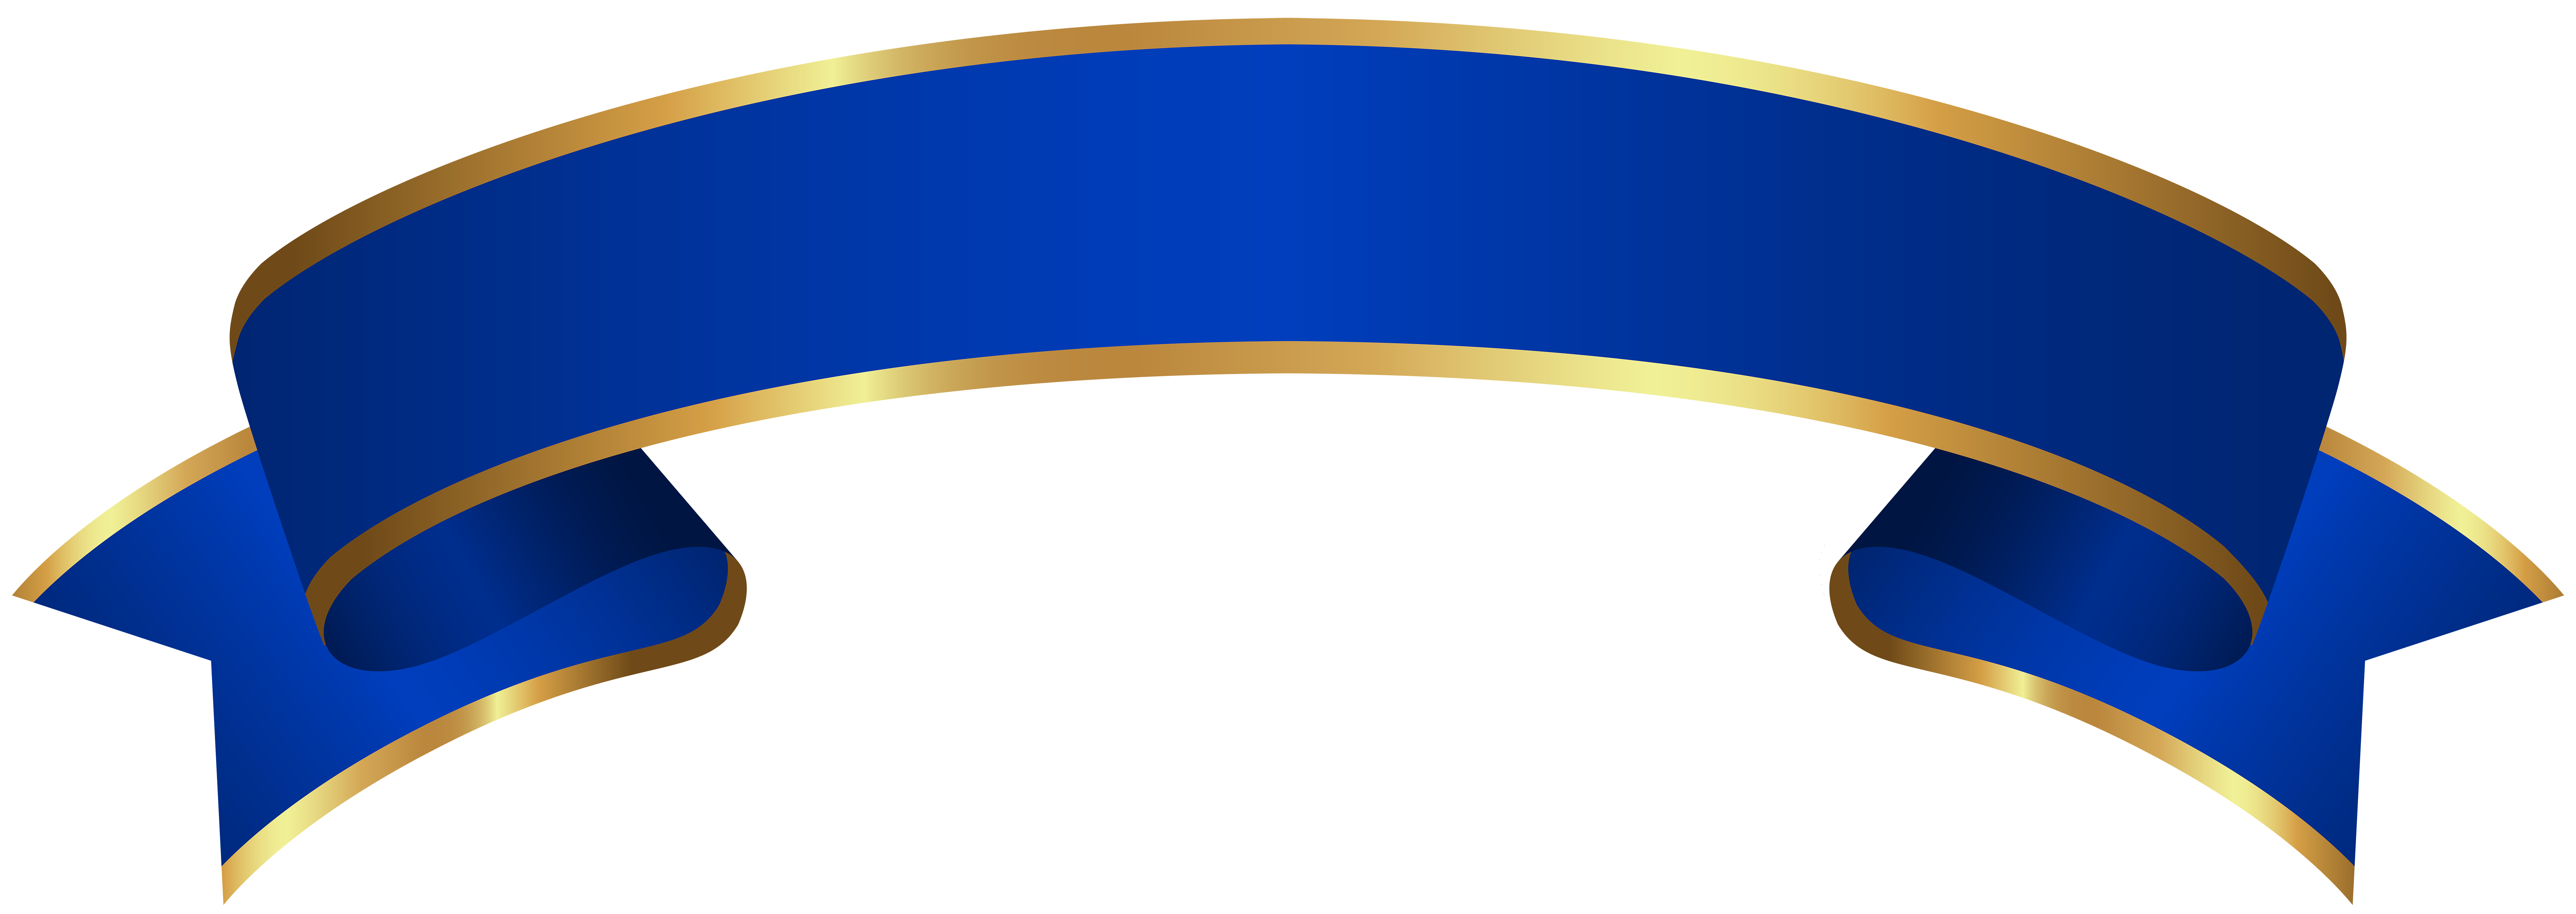 Blue Gold Banner Transparent Clip Art.